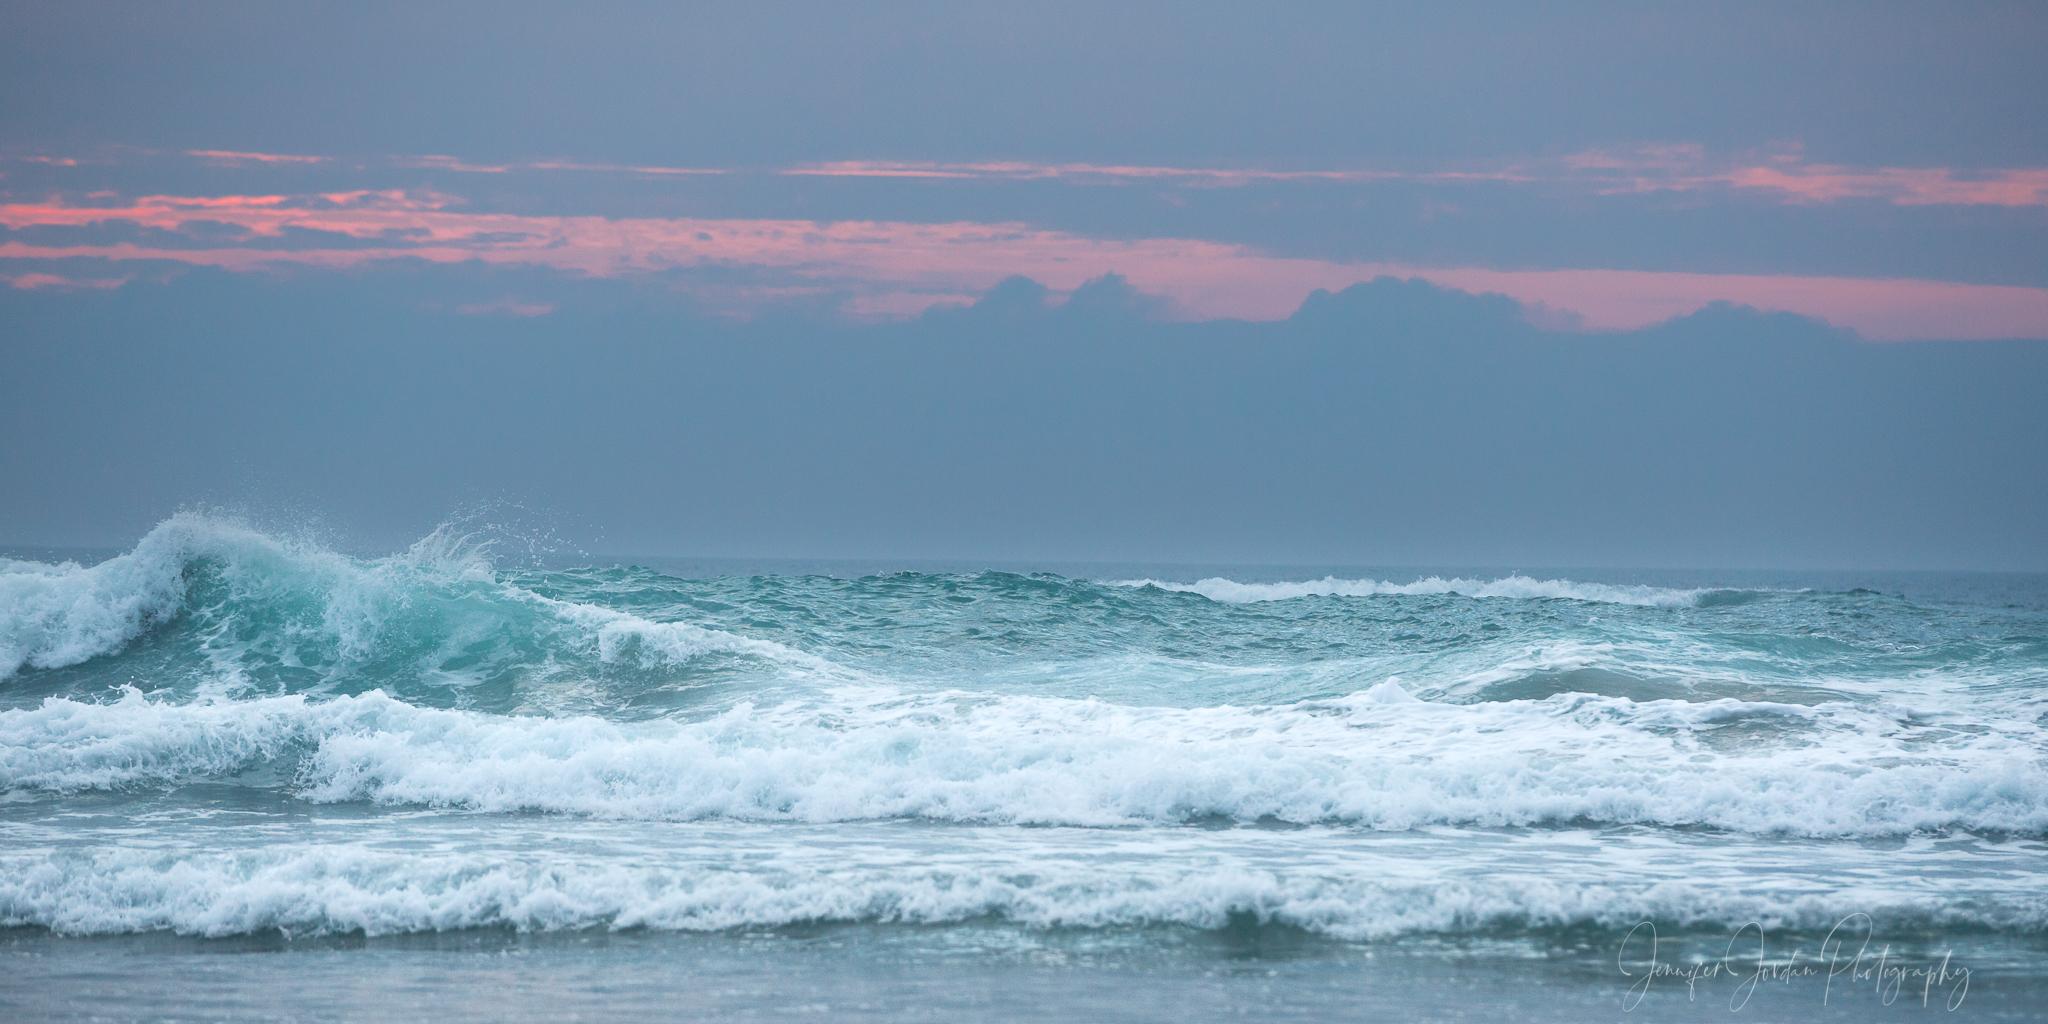 Fine Art Ocean Photography by Jennifer Jordan Photography